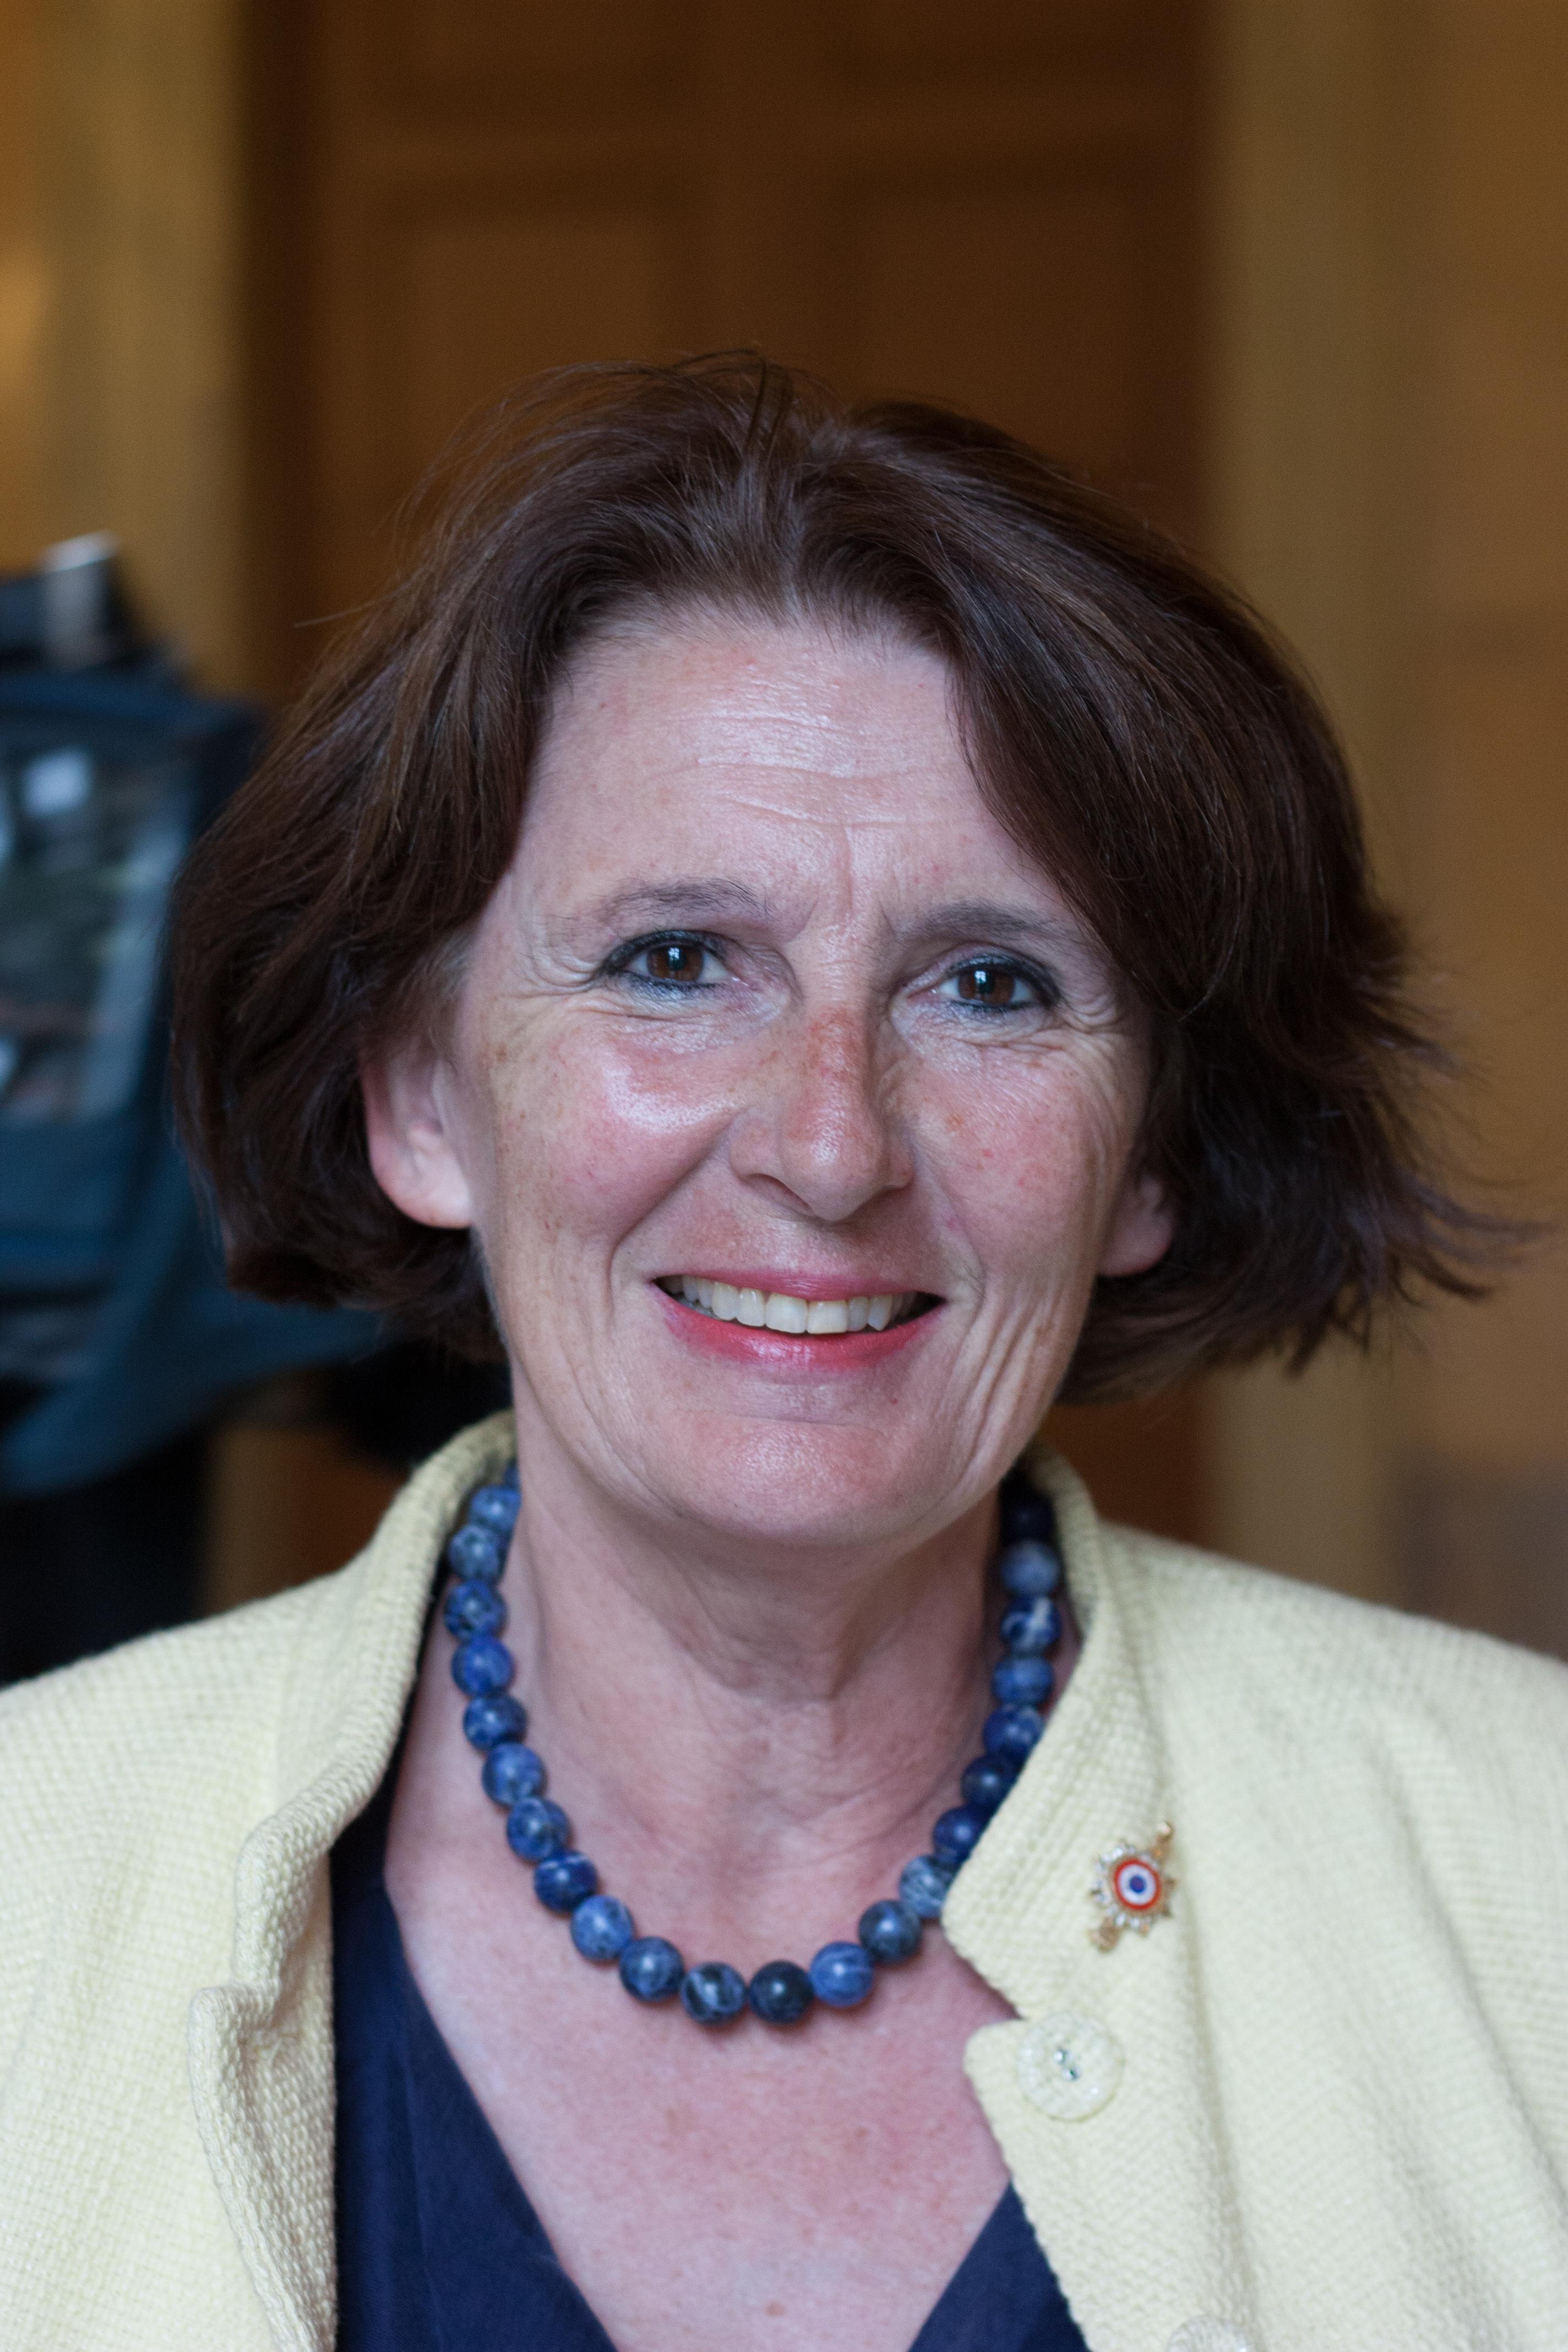 Anne-Yvonne <b>Le Dain</b> défend l'article 49.3 - DeputeXIVeLegVeRep-Anne-Yvonne_Le_Dain